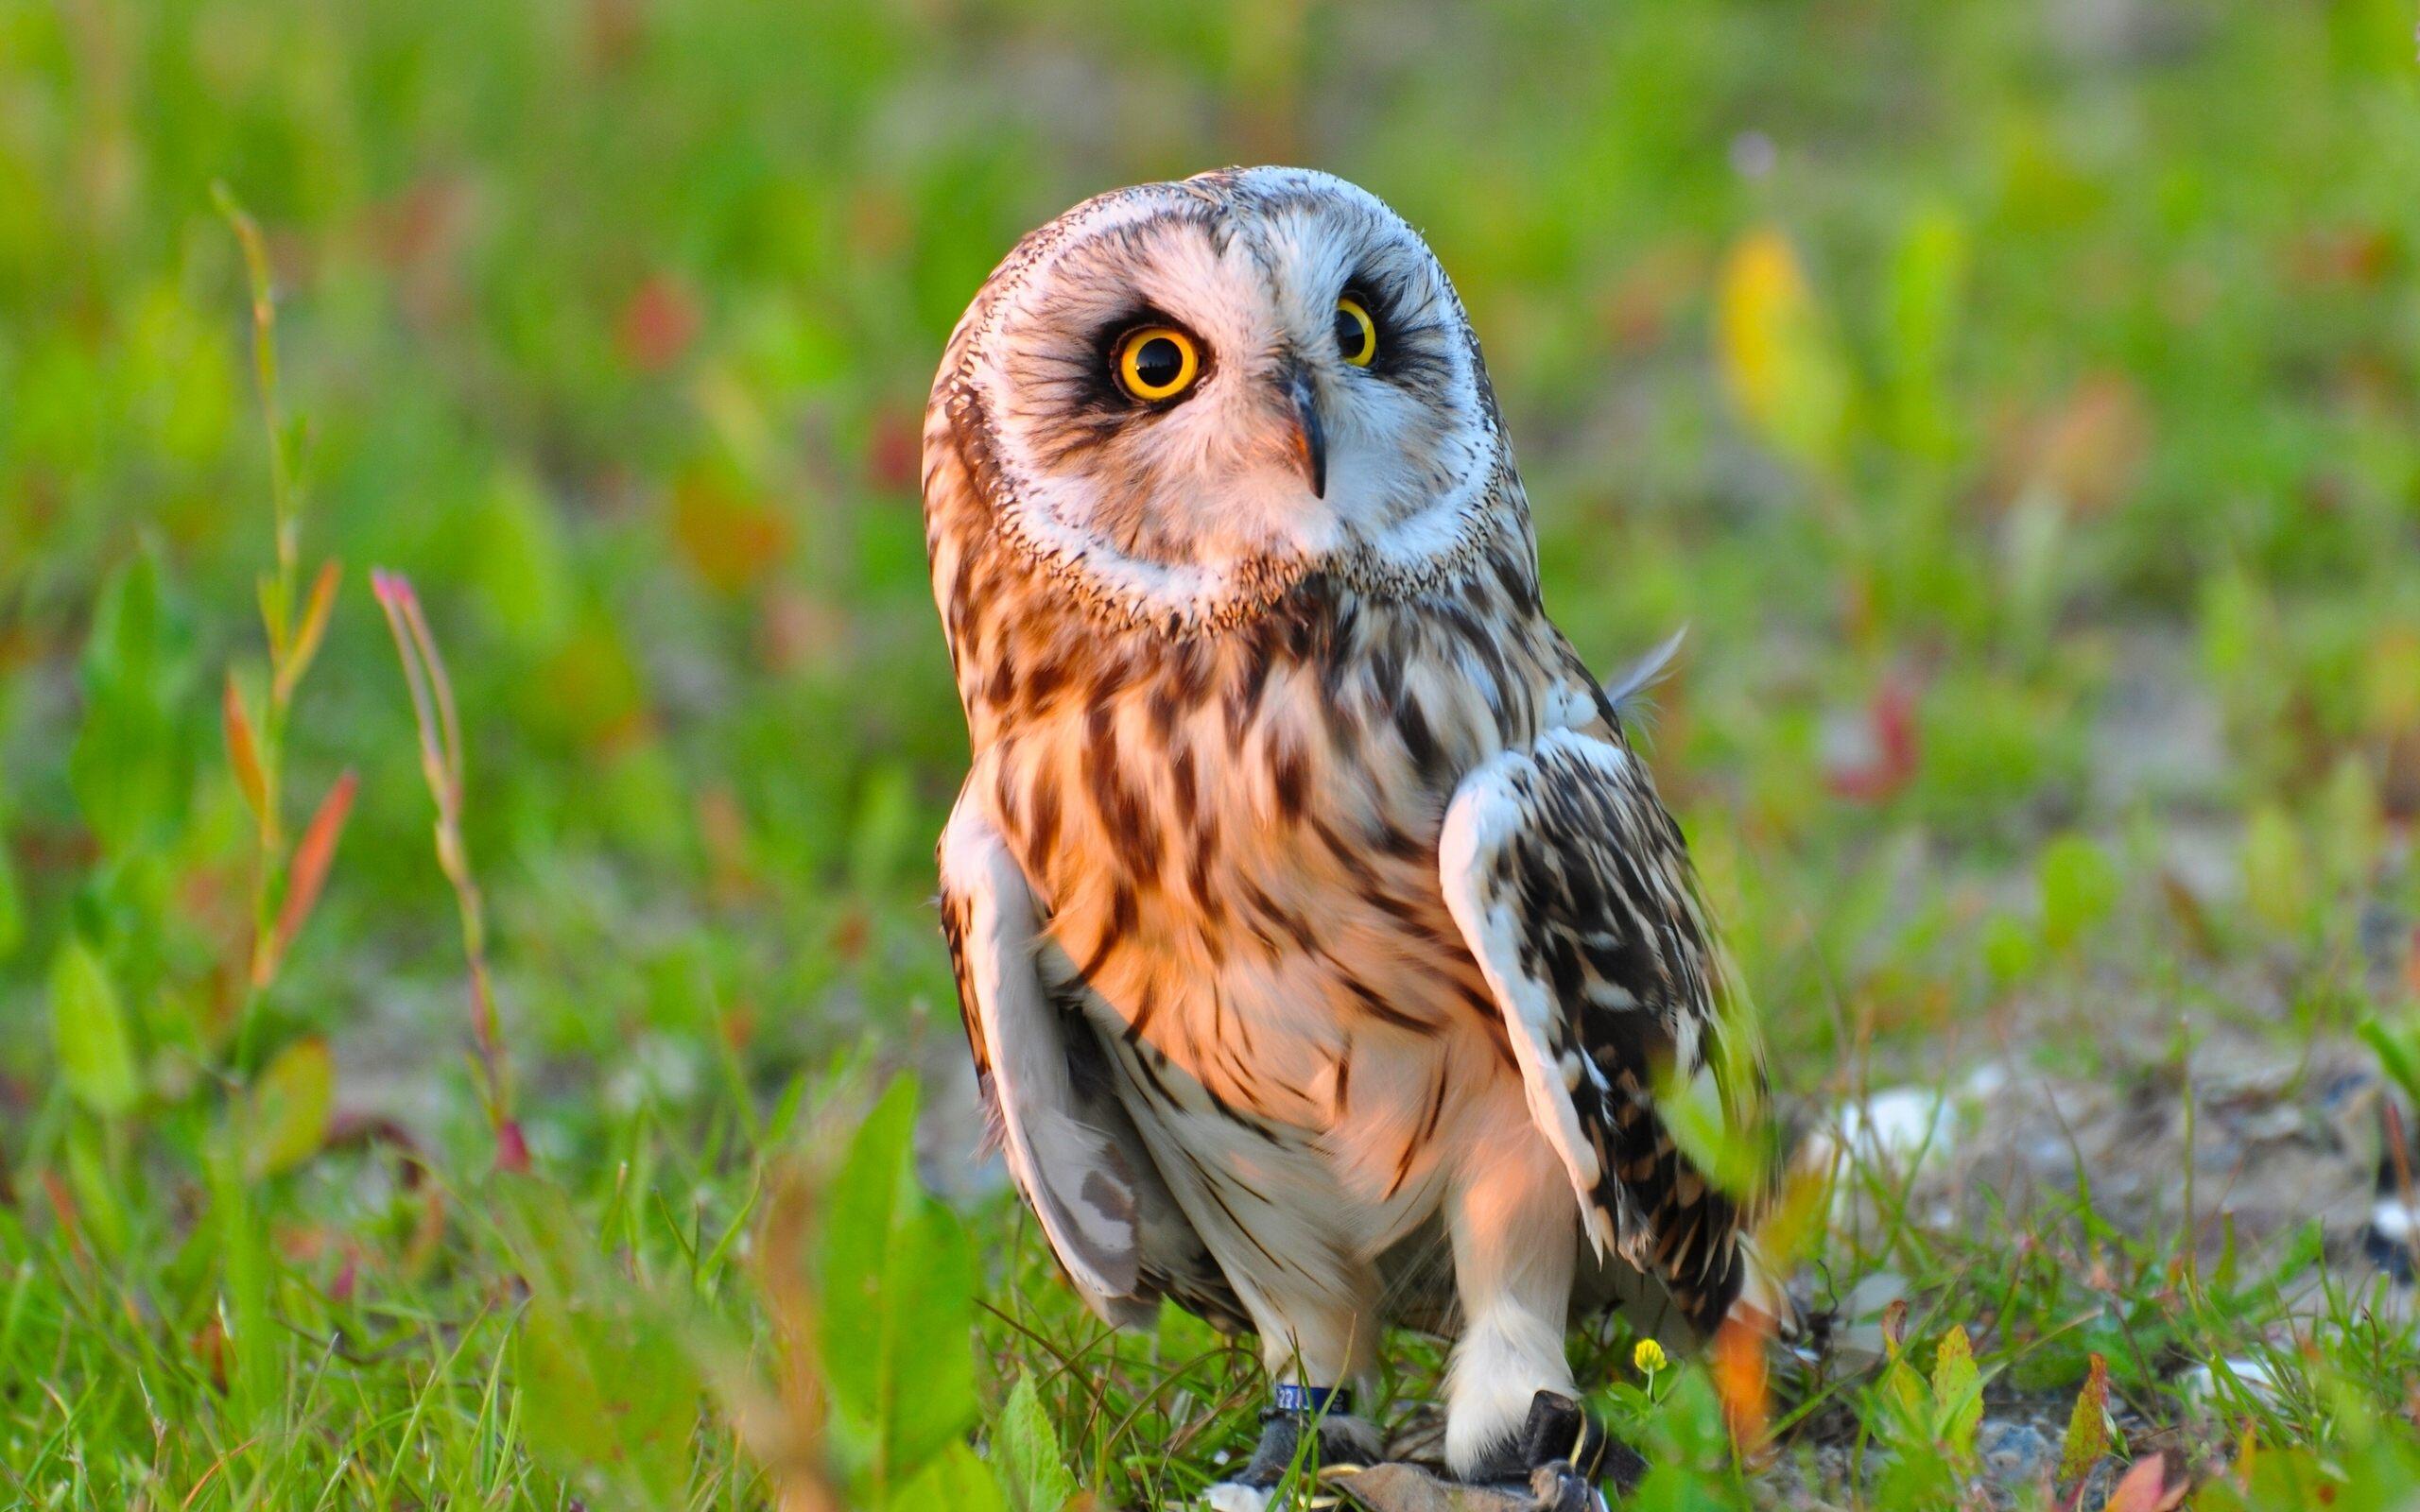 [71+] Cute Owl Wallpapers On WallpaperSafari